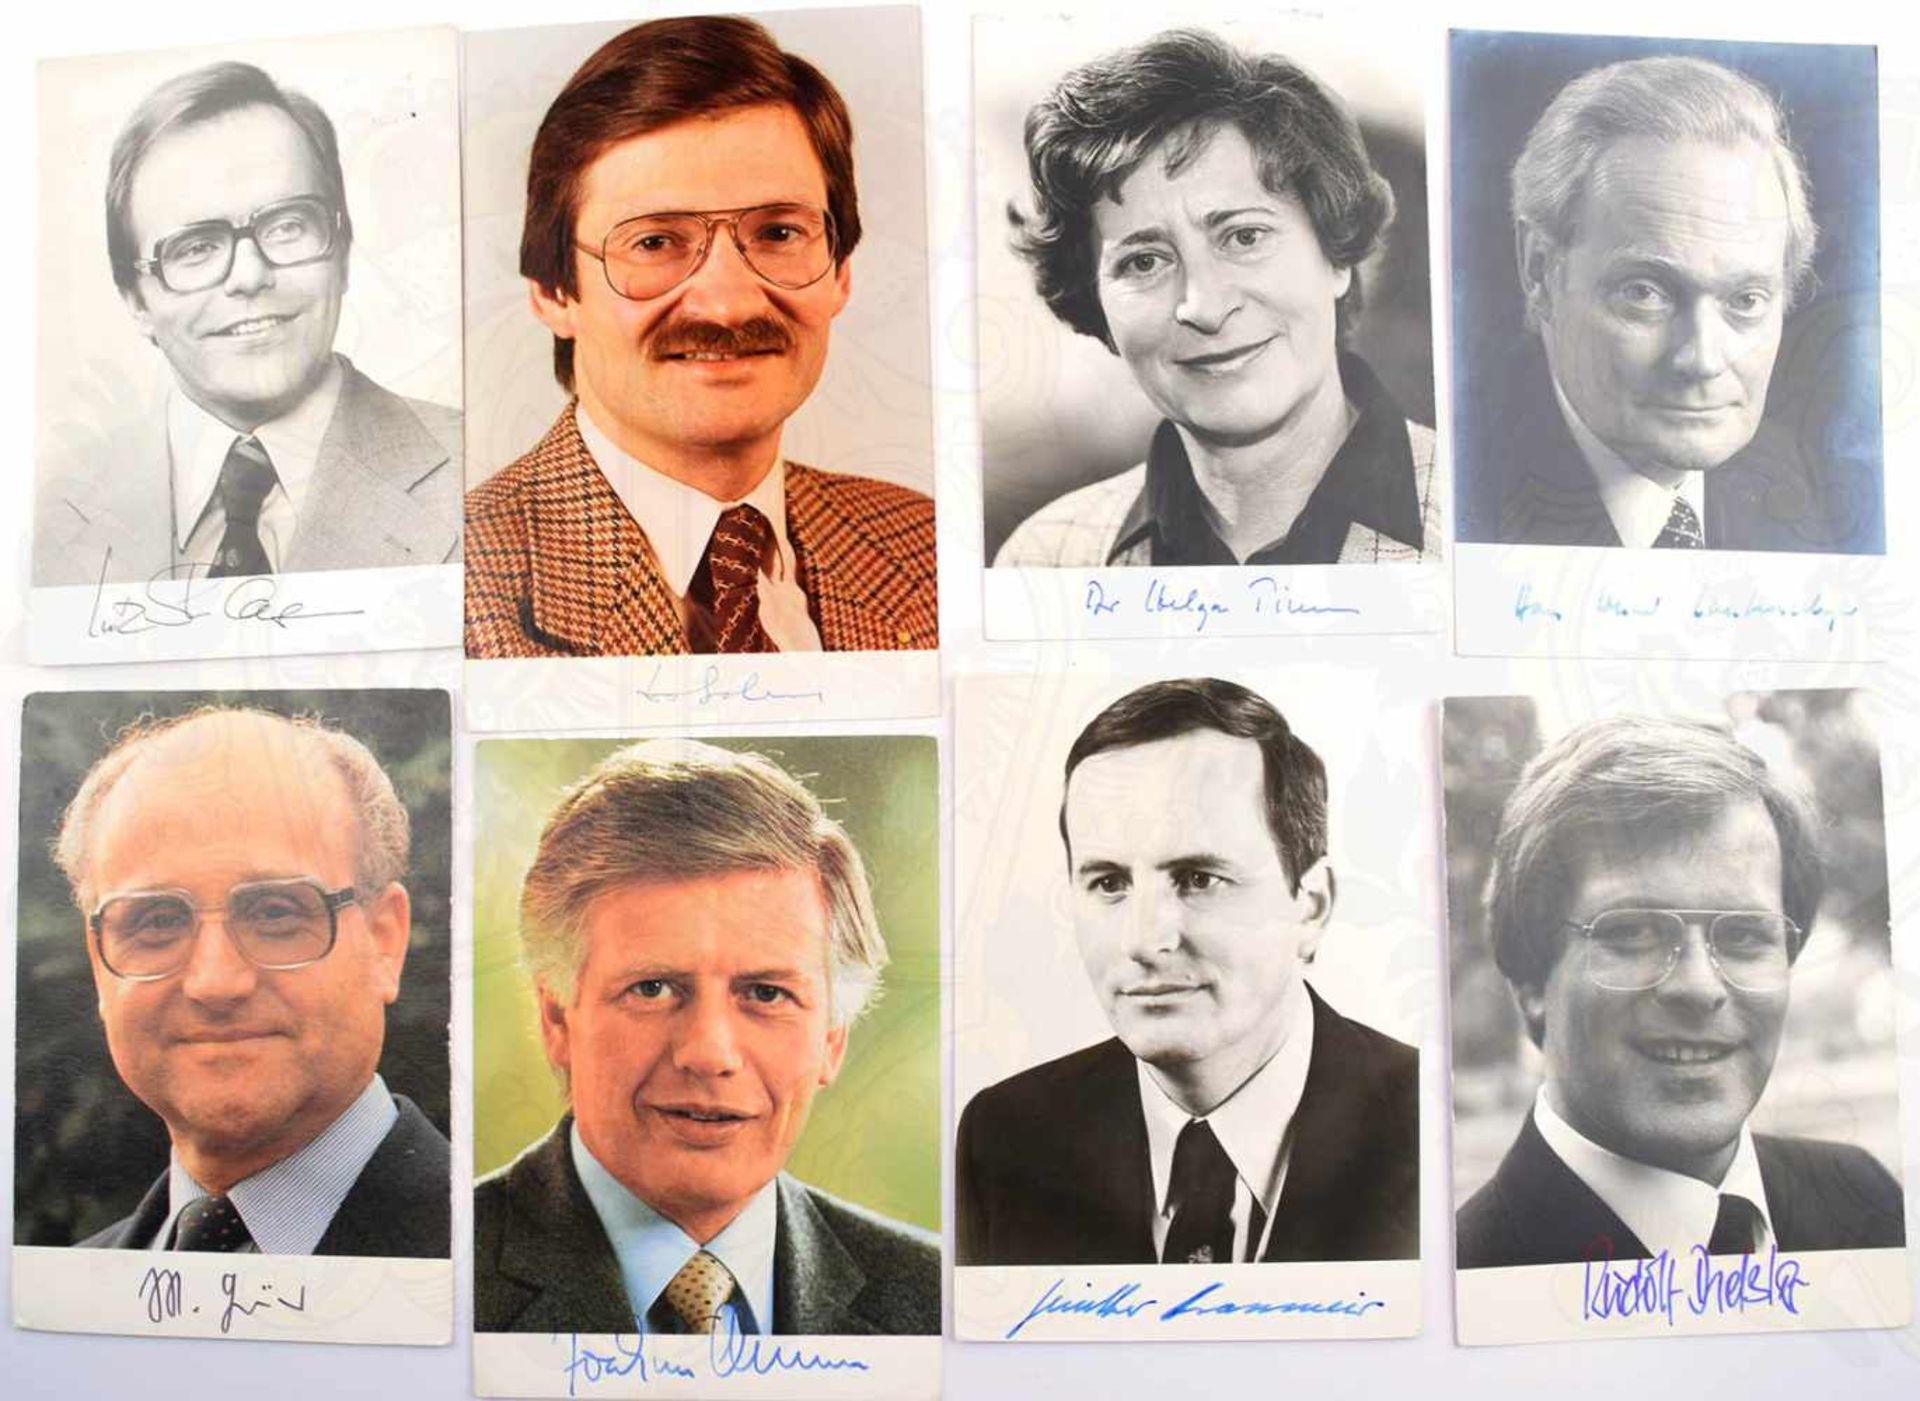 100 AUTOGRAMMKARTEN DEUTSCHE POLITIK 1979-1987, Bundesminister, Staatsminister Parlamentarische